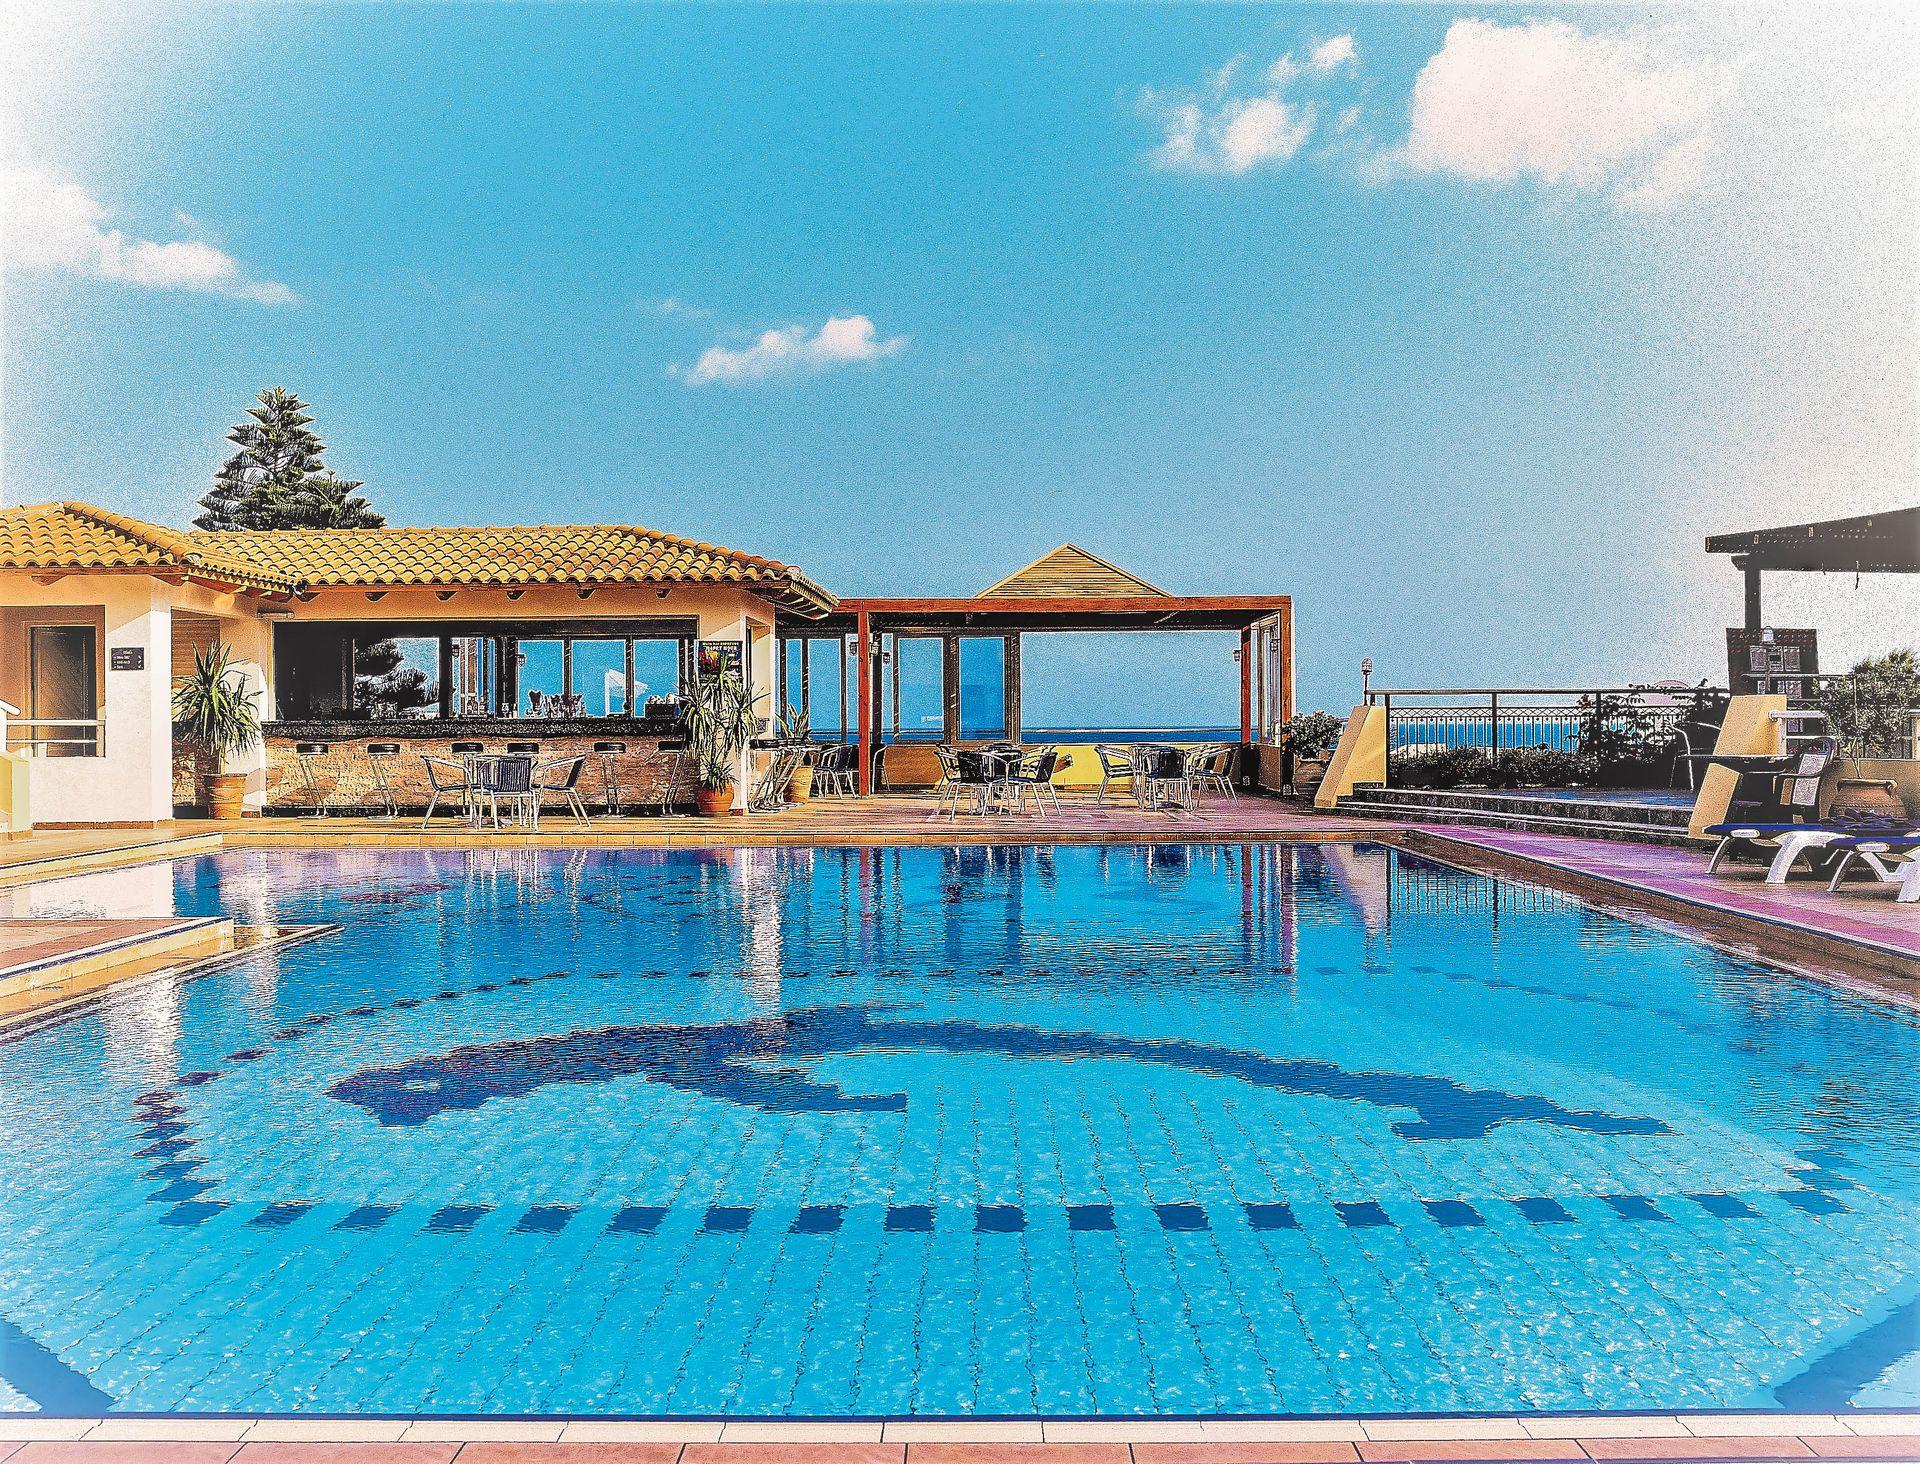 4* Castello Village Resort - Λασίθι, Κρήτη ✦ 2 Ημέρες (1 Διανυκτέρευση) ✦ 2 άτομα ✦ Πρωινό ✦ 01/09/2021 έως 30/09/2021 ✦ Κοντά στην παραλία!